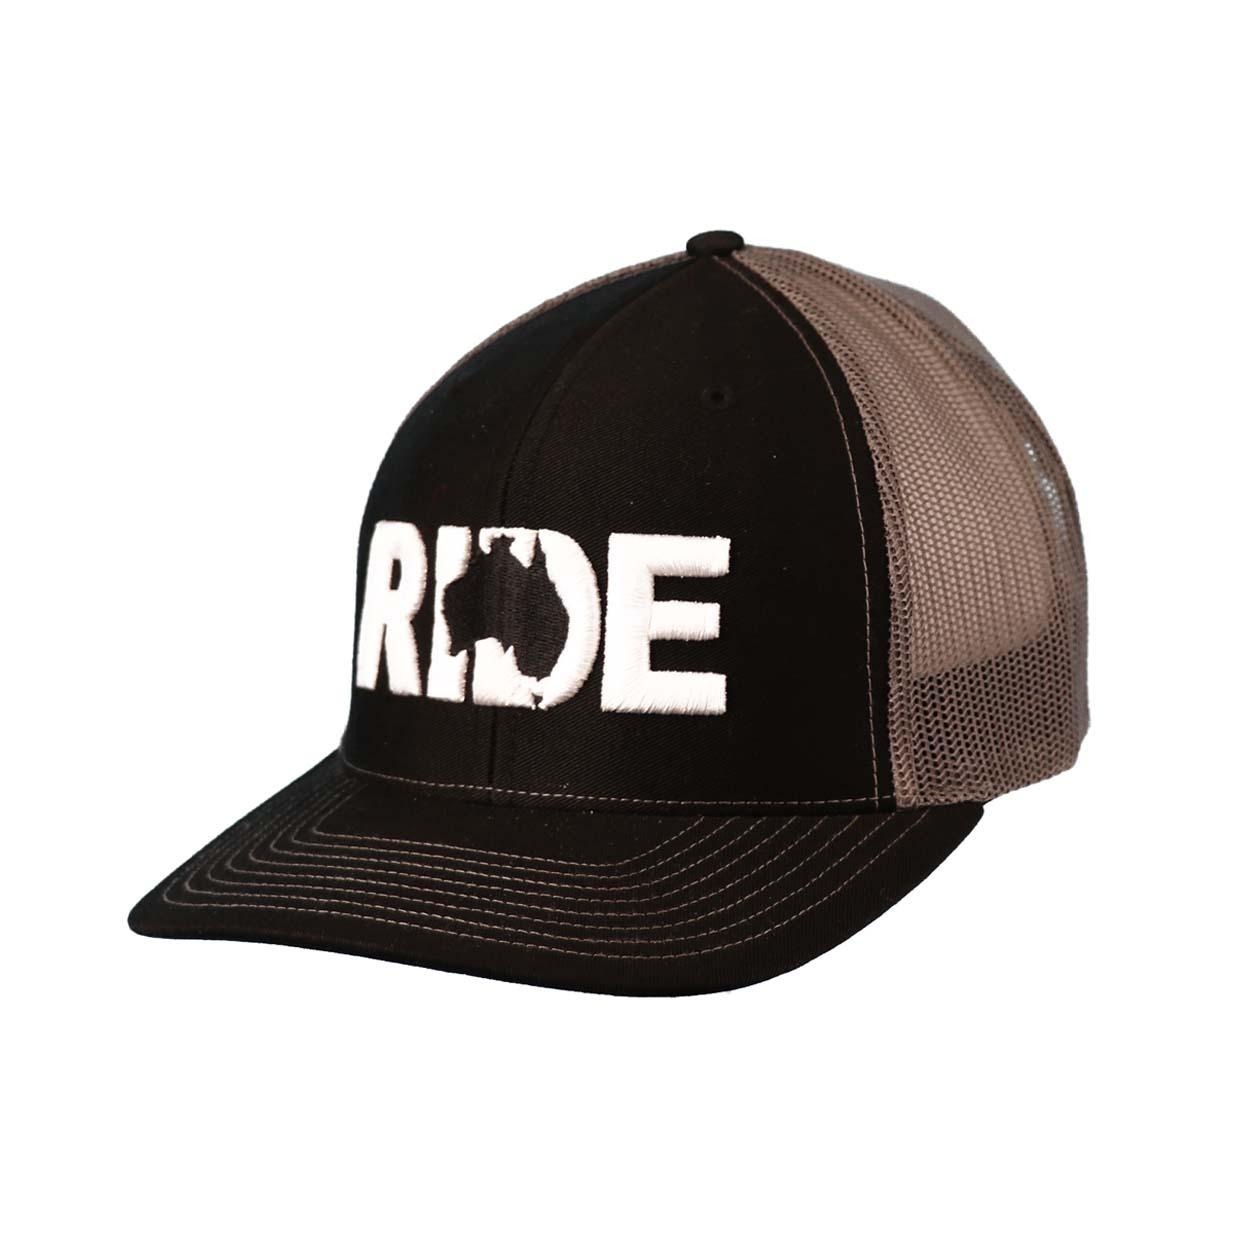 Ride Australia Classic Embroidered Snapback Trucker Hat Black/White